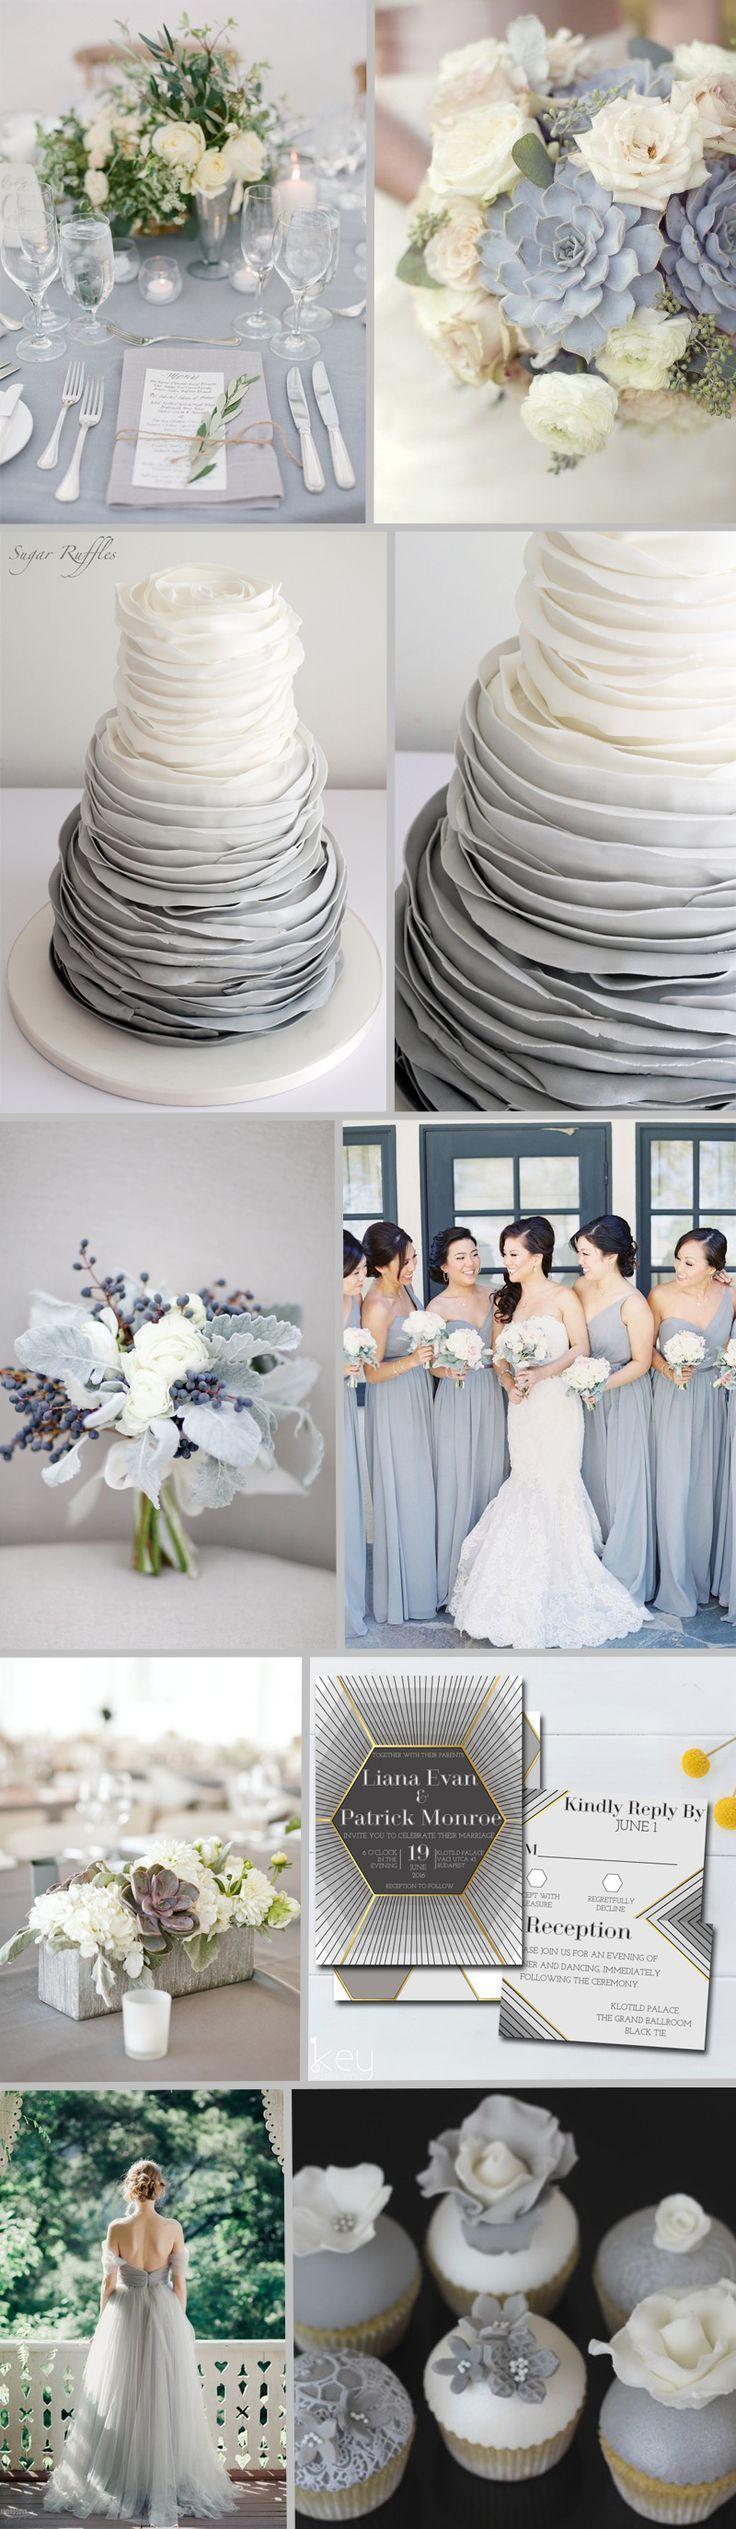 FiftyFlowers - Dove Gray Wedding Inspiration Find your inspo at www.pinterest.com/laurenweds/wedding-decor